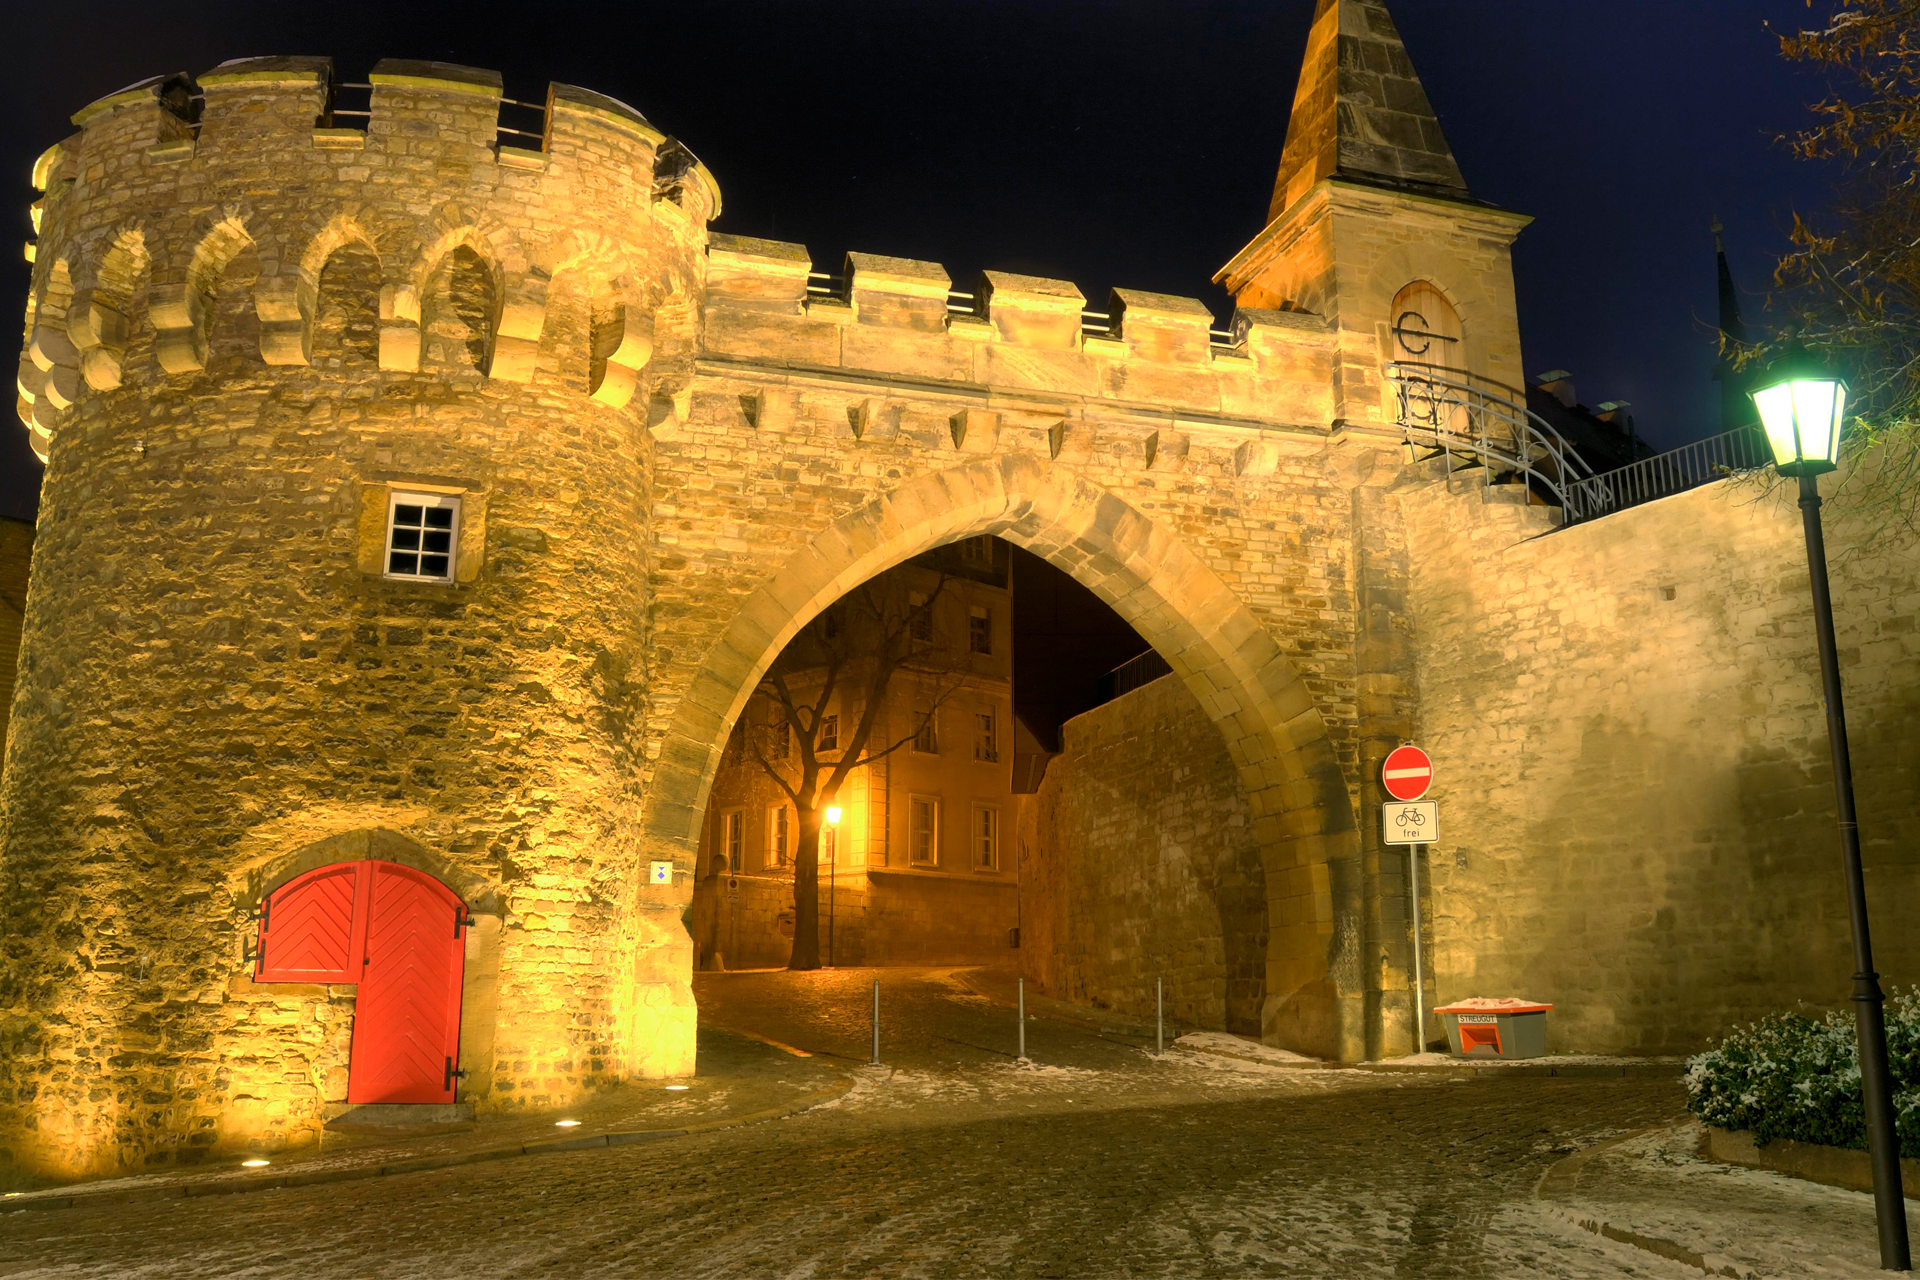 Krummes Tor in Merseburg © Wolfgang Kubak